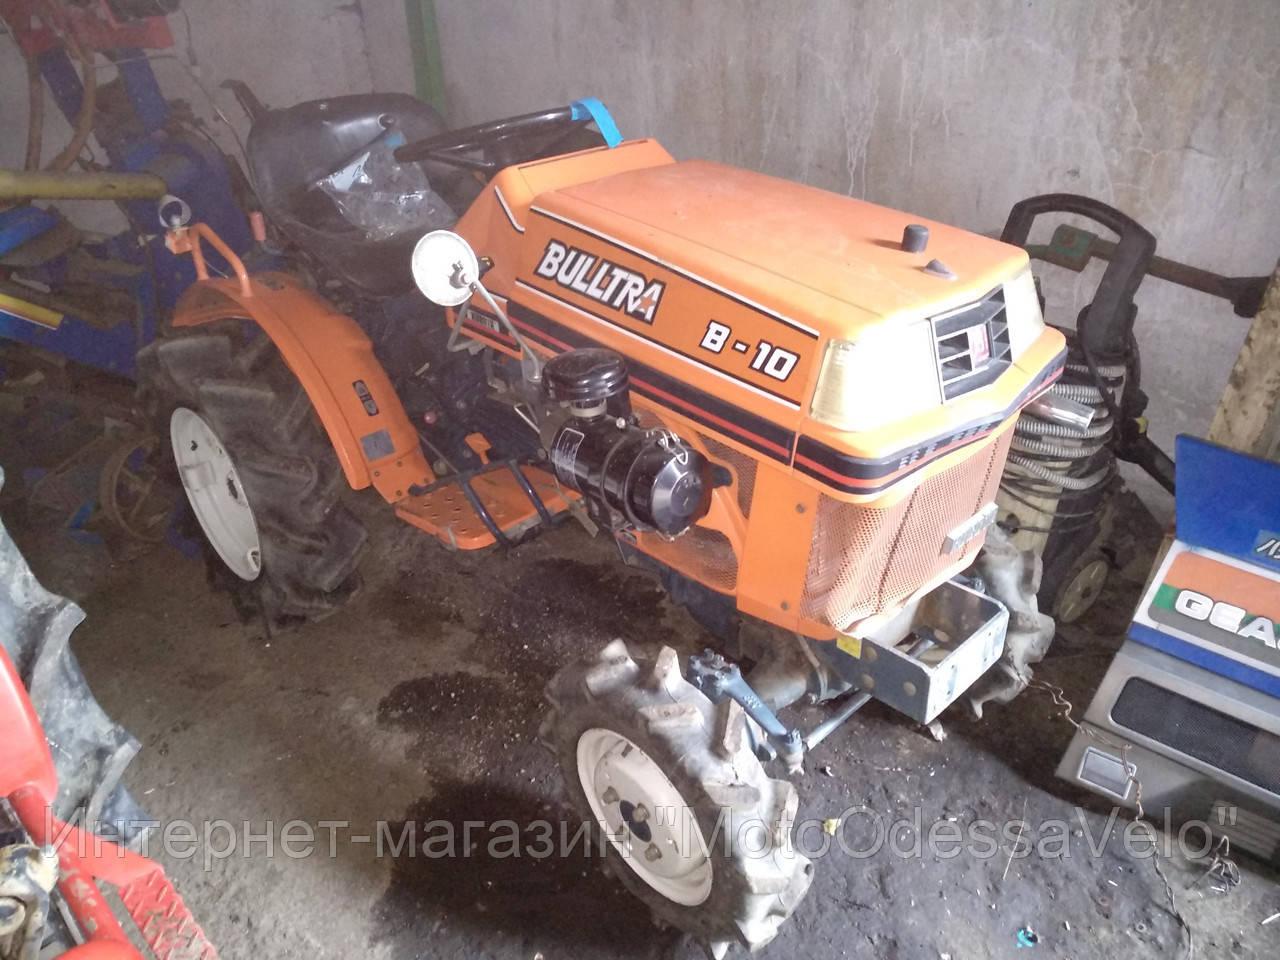 Мини трактор Kubota Bulltra B-10 4wd